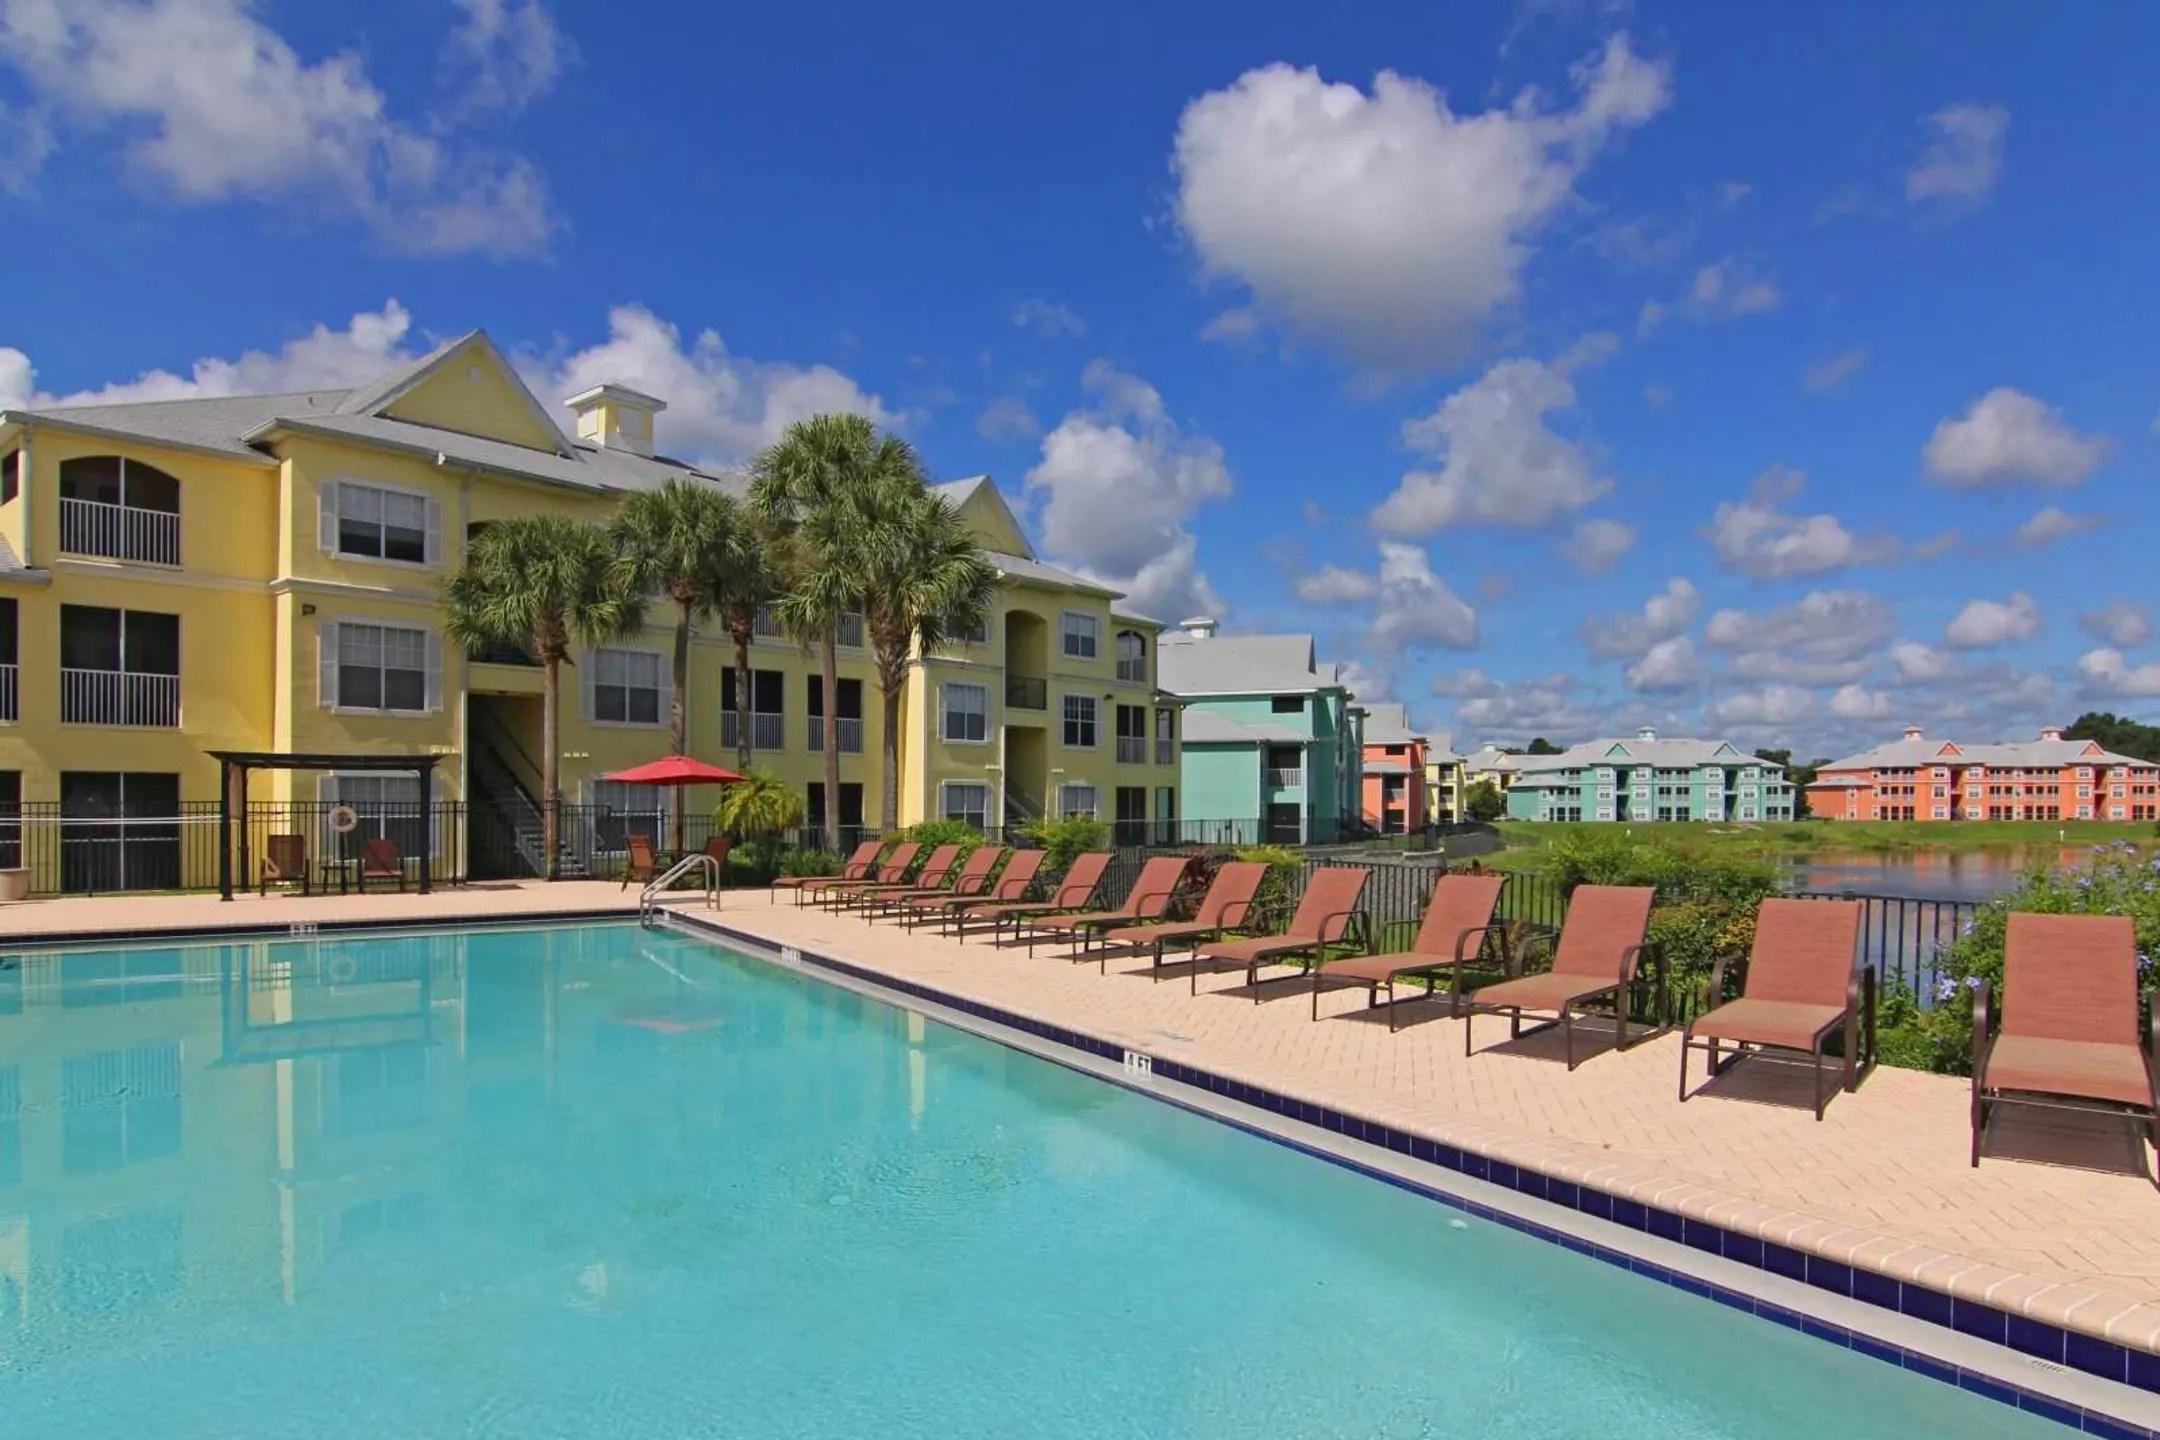 Bermuda Estates At Ormond Beach Apartments  Ormond Beach FL 32174